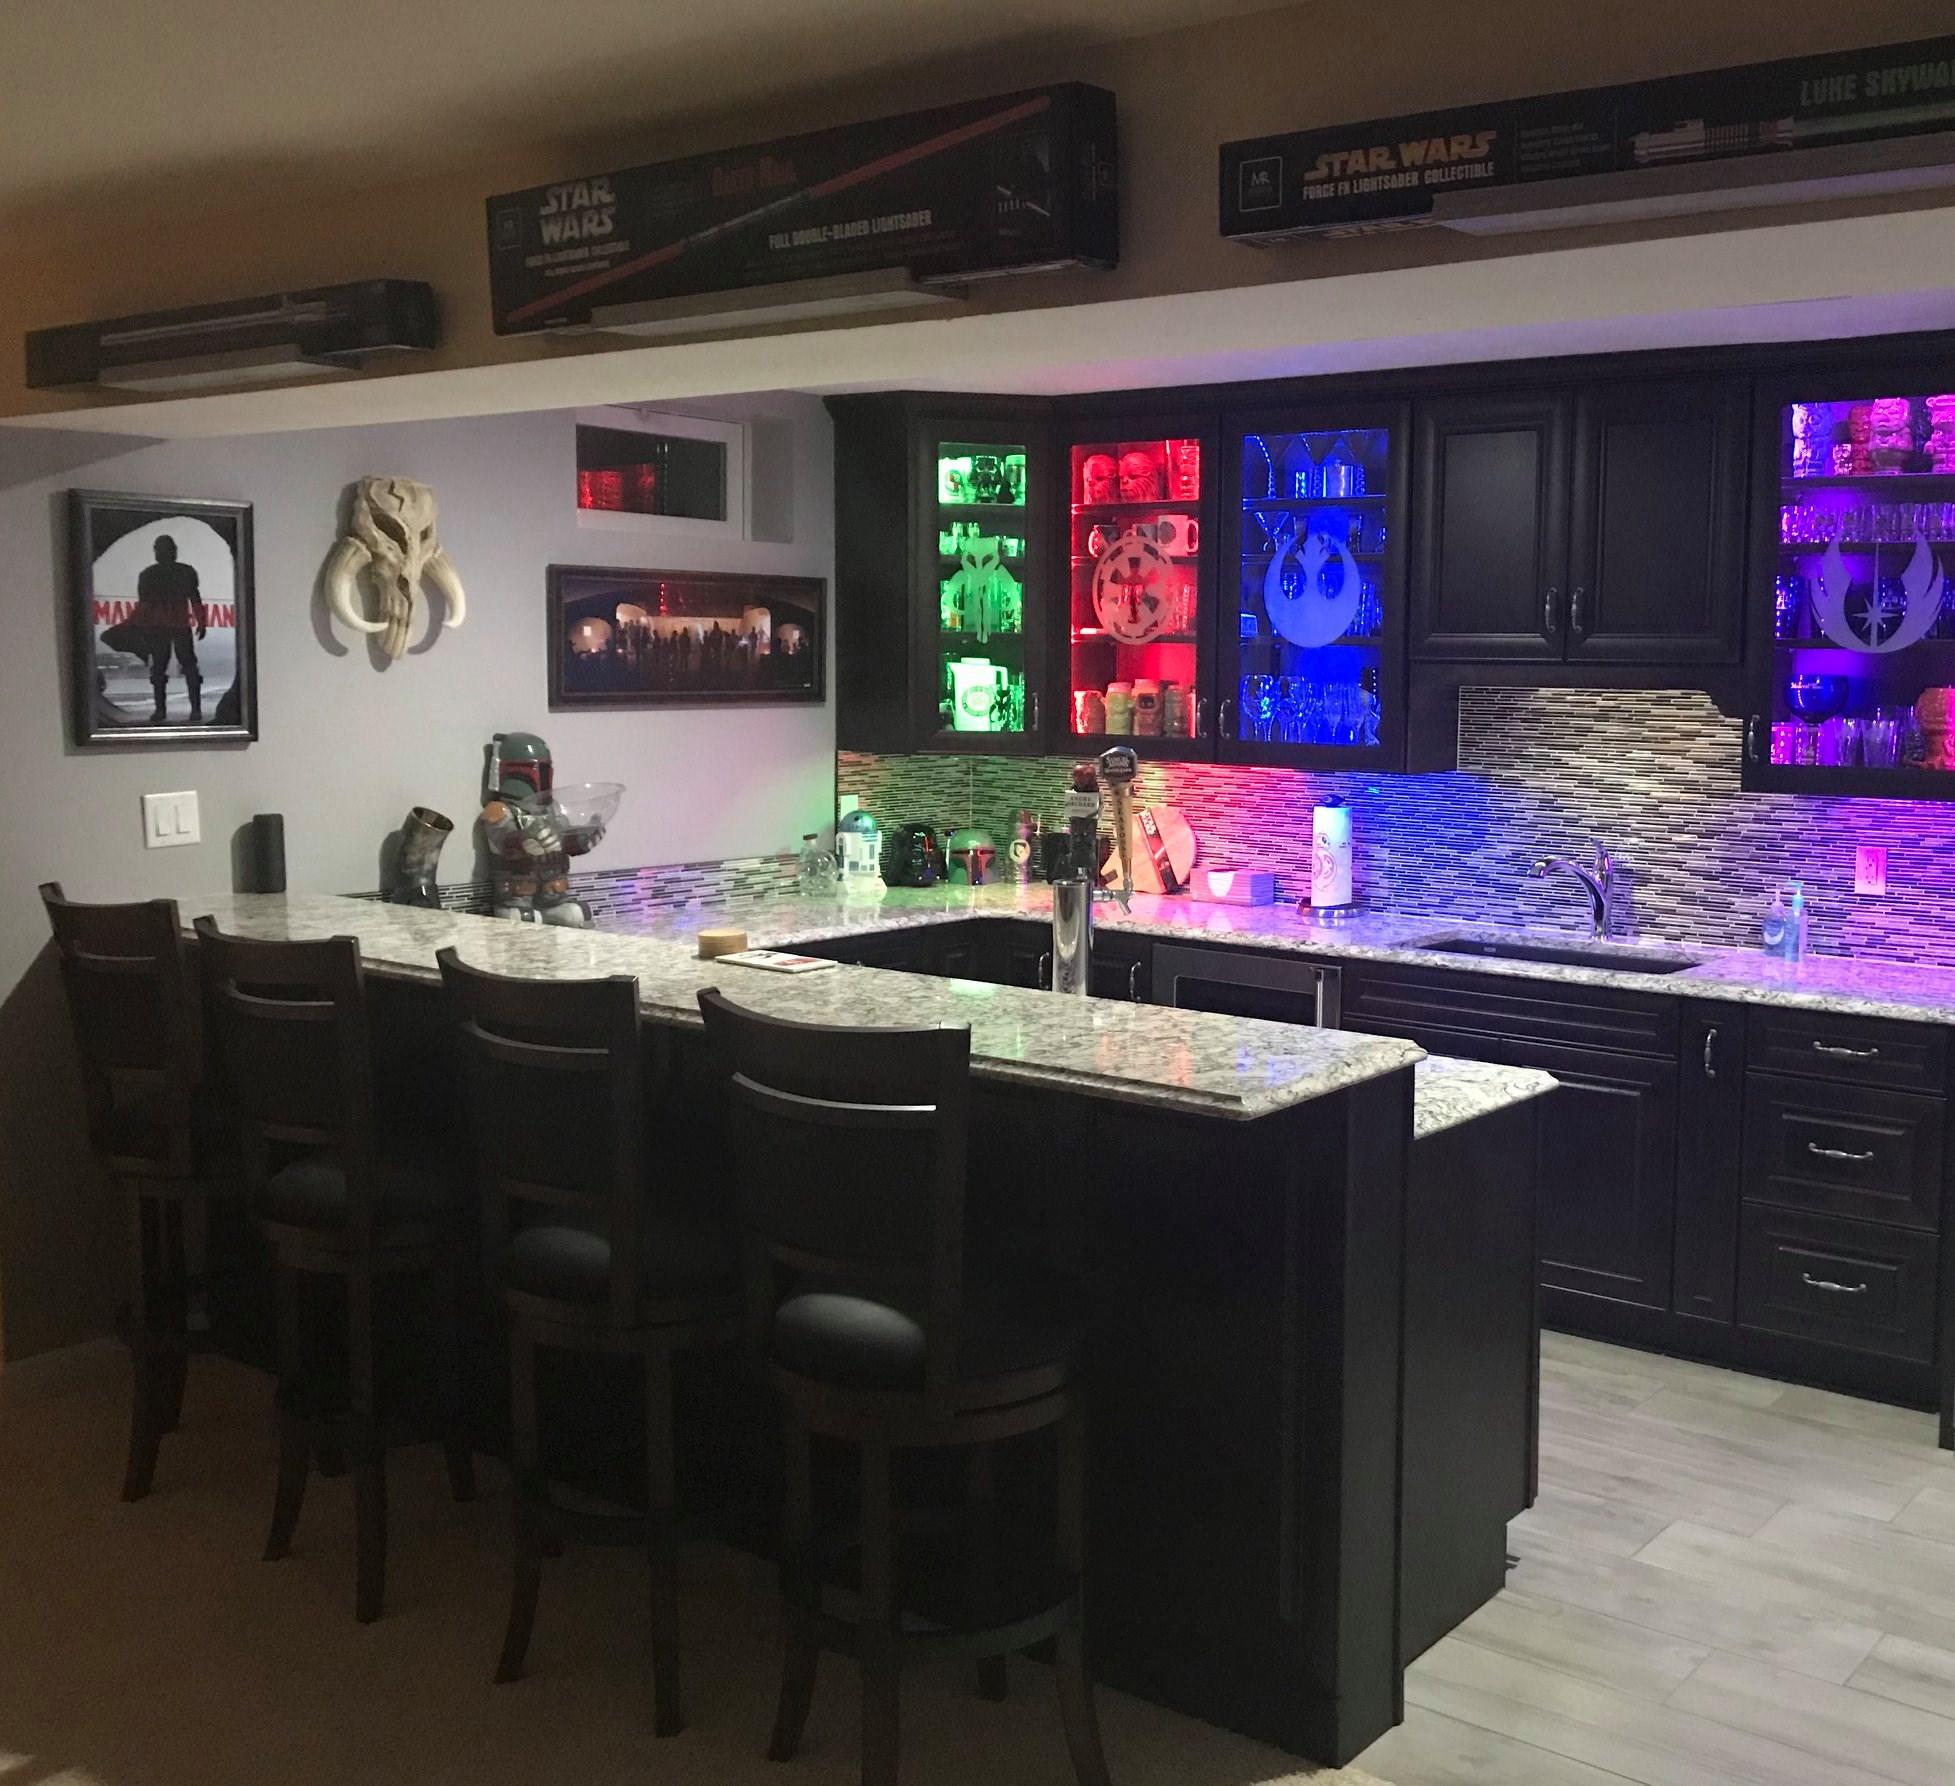 Office, Studio, Wall Art Star Wars themed kitchen